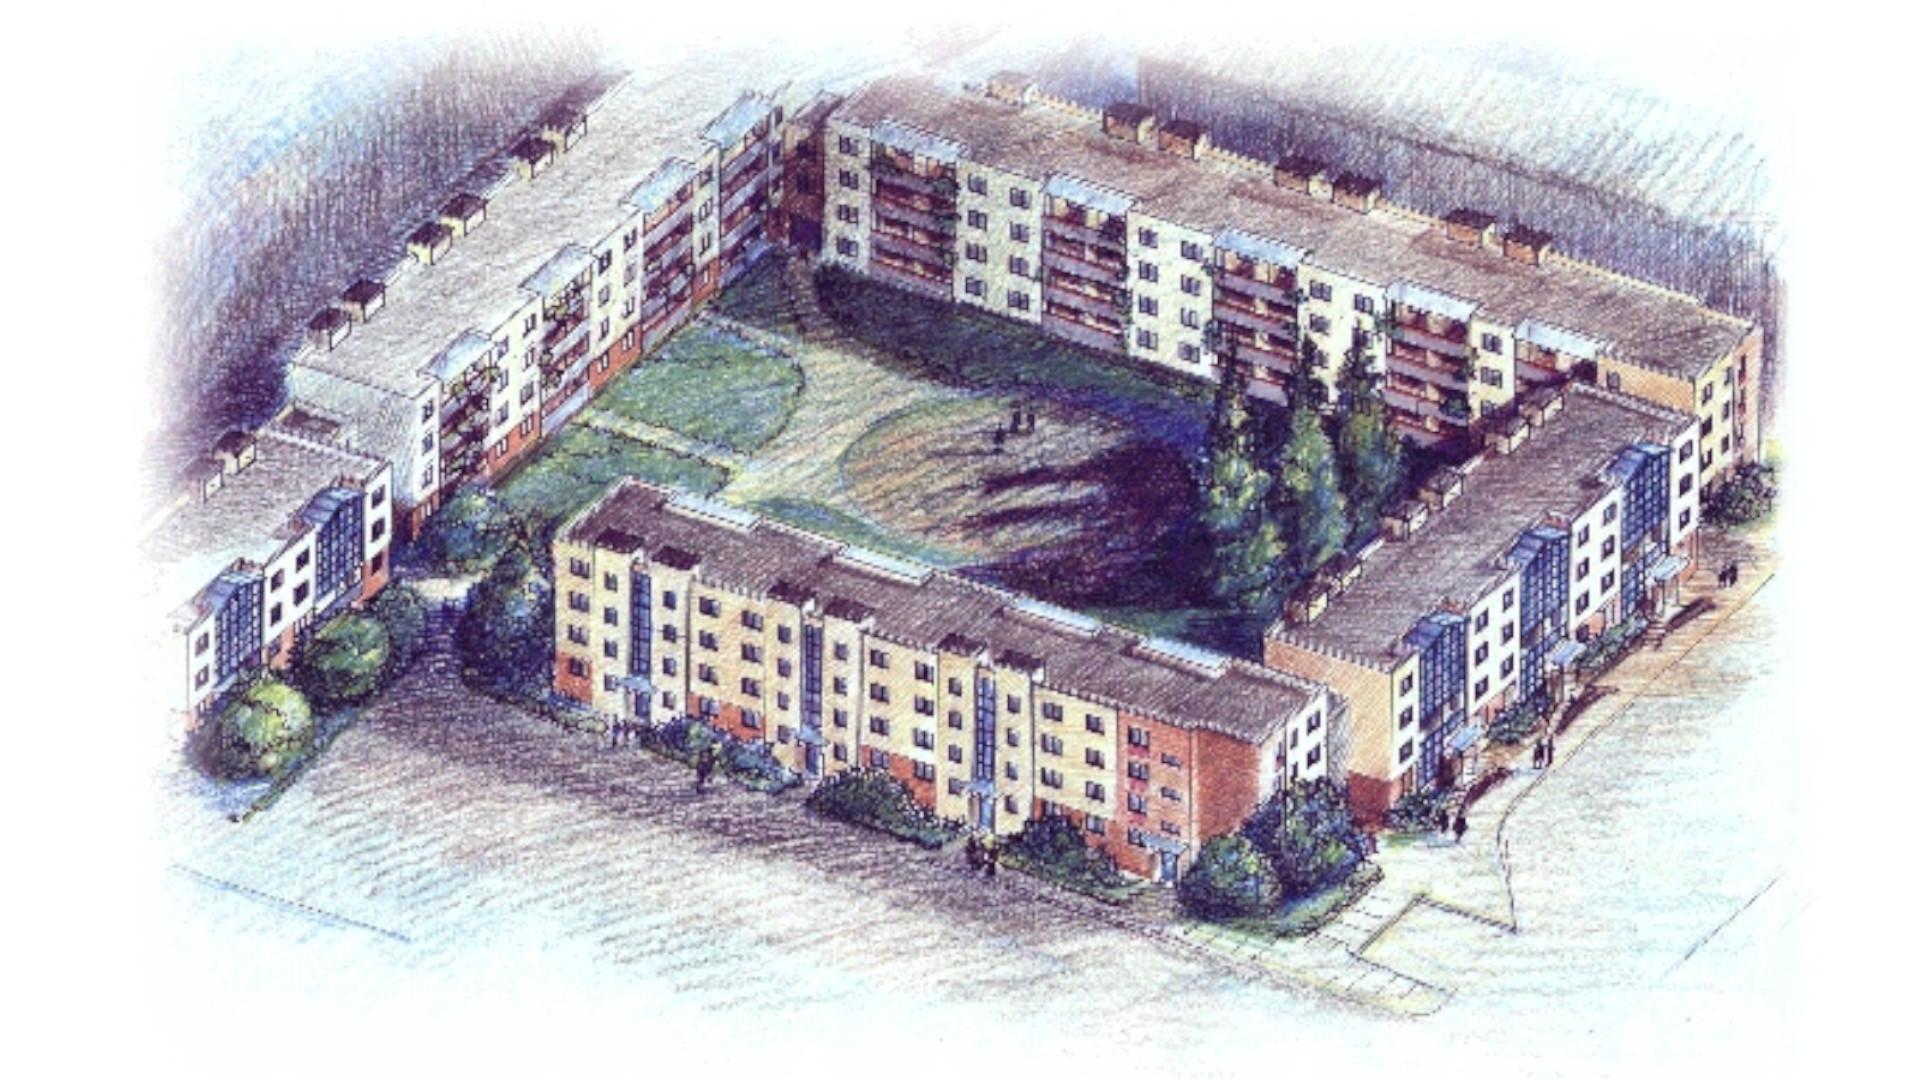 06-plattenbau-bernau-skizze-w